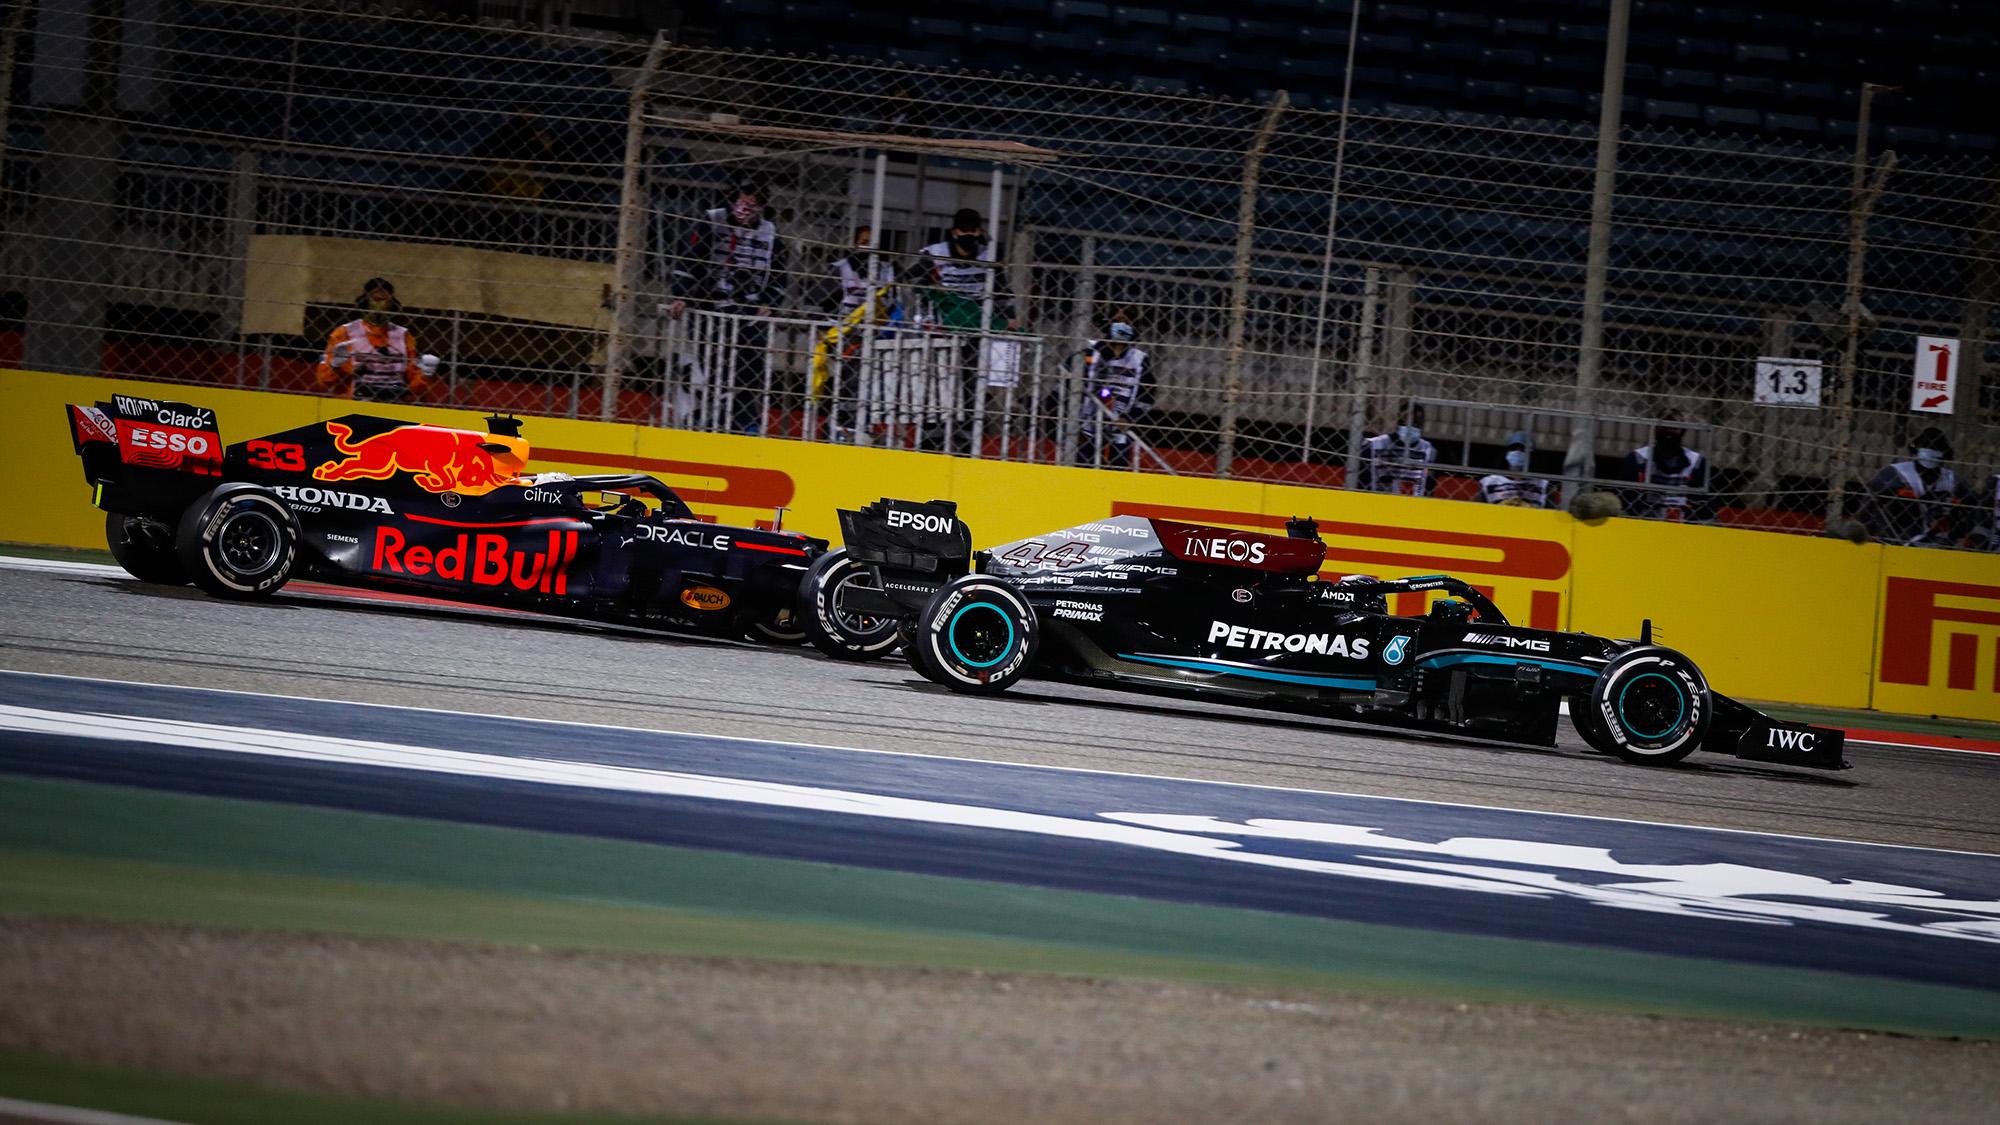 Max Verstappen and Lewis Hamilton battle in the 2021 Bahrain Grand Prix